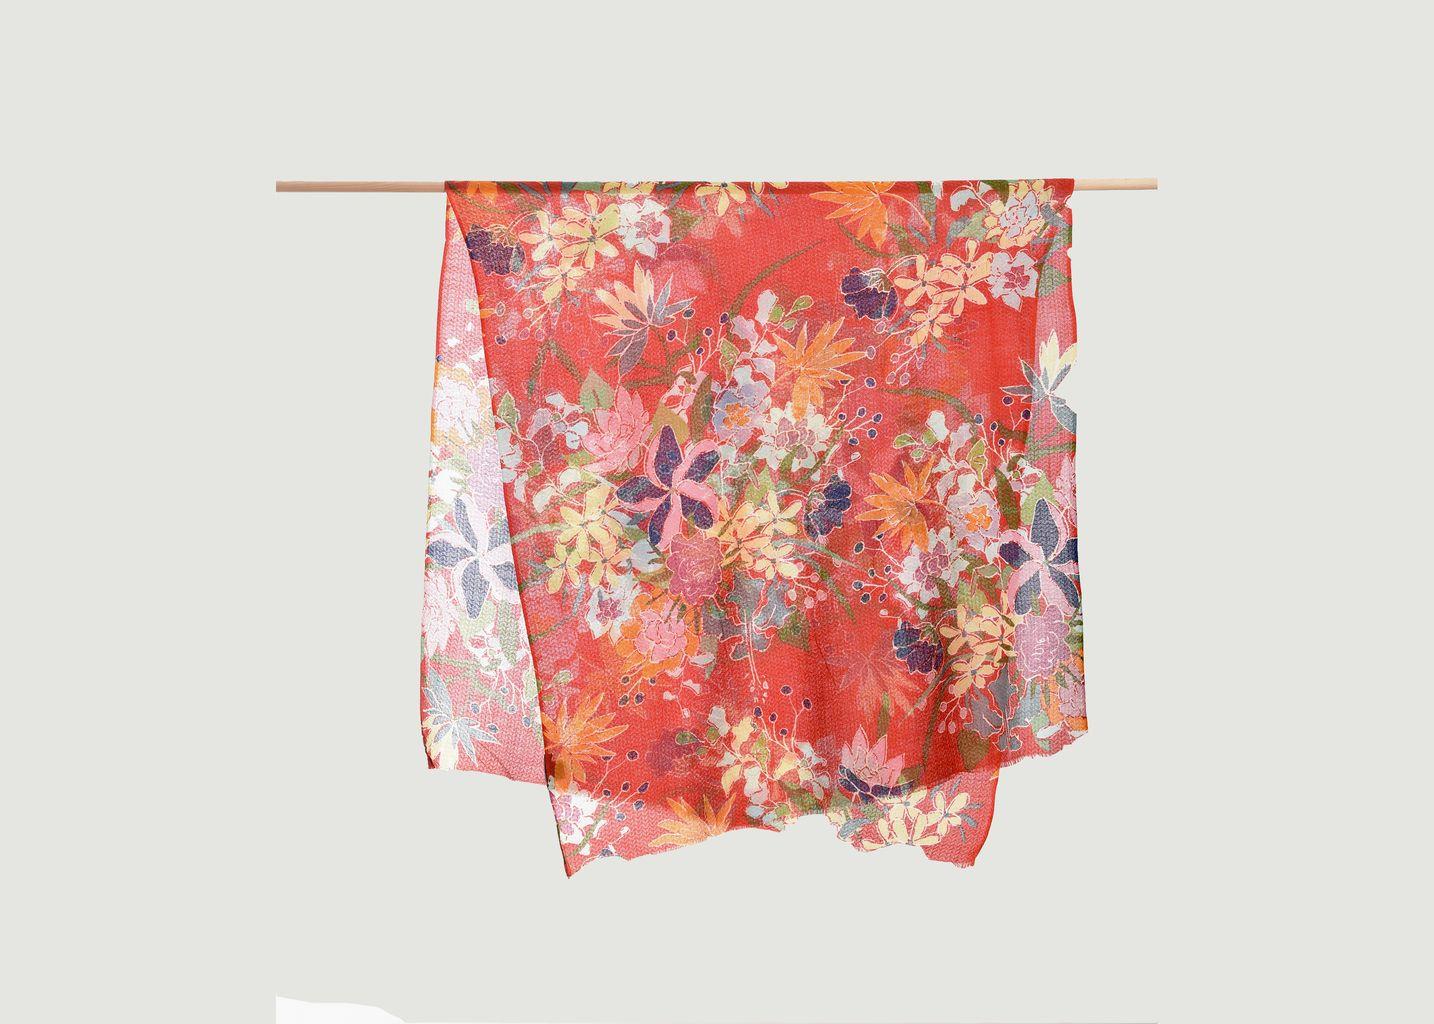 Echarpe motif fleuri en laine - Epice